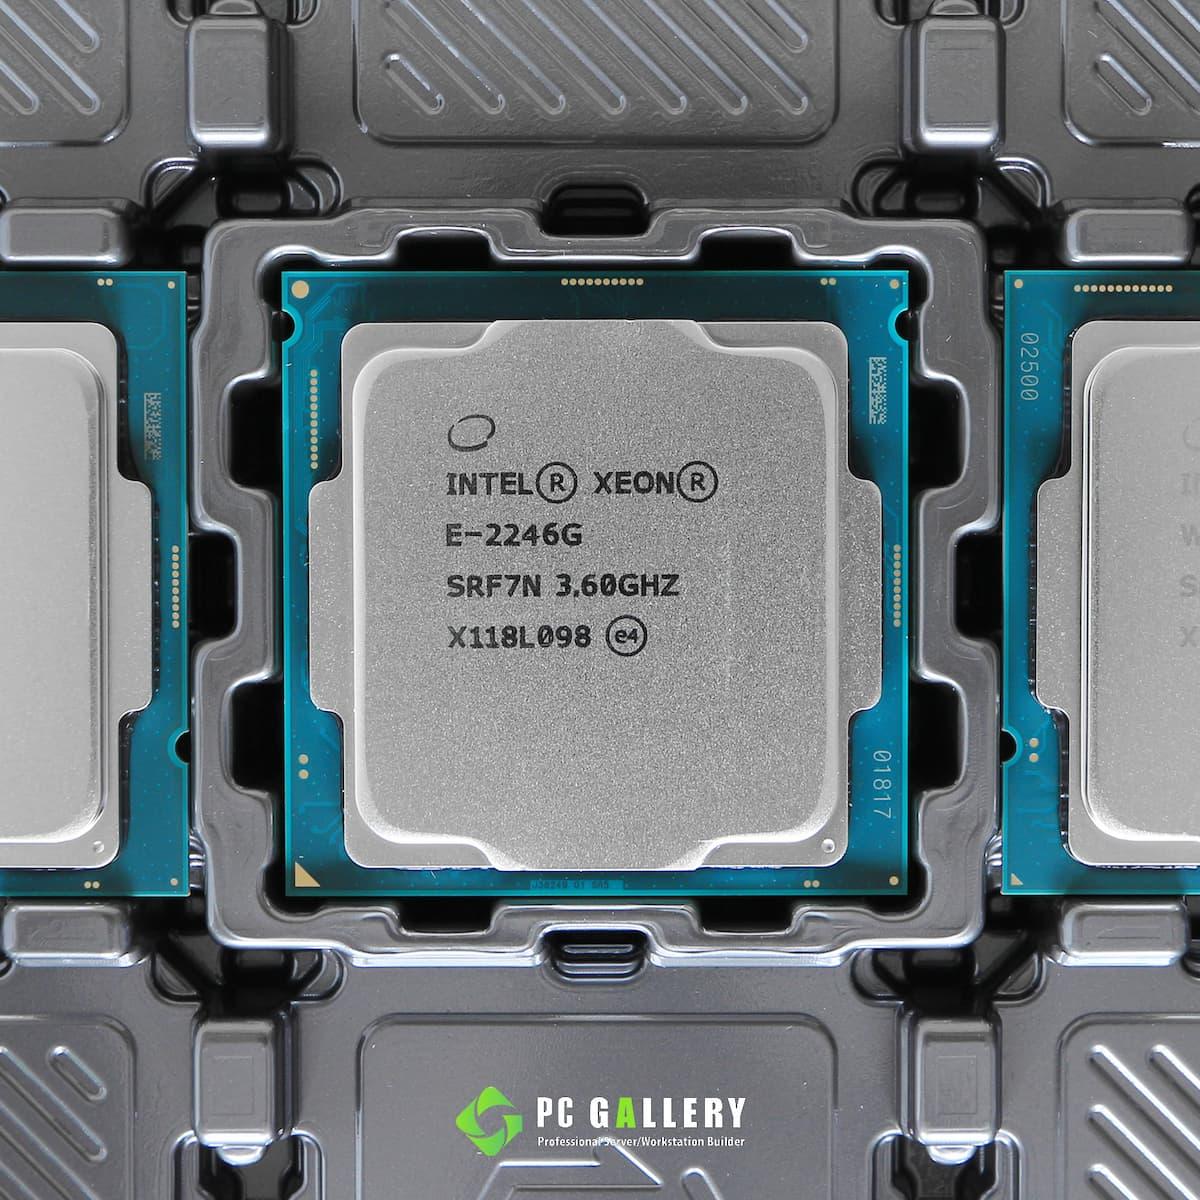 Intel-Xeon-E-2246G (Tray)